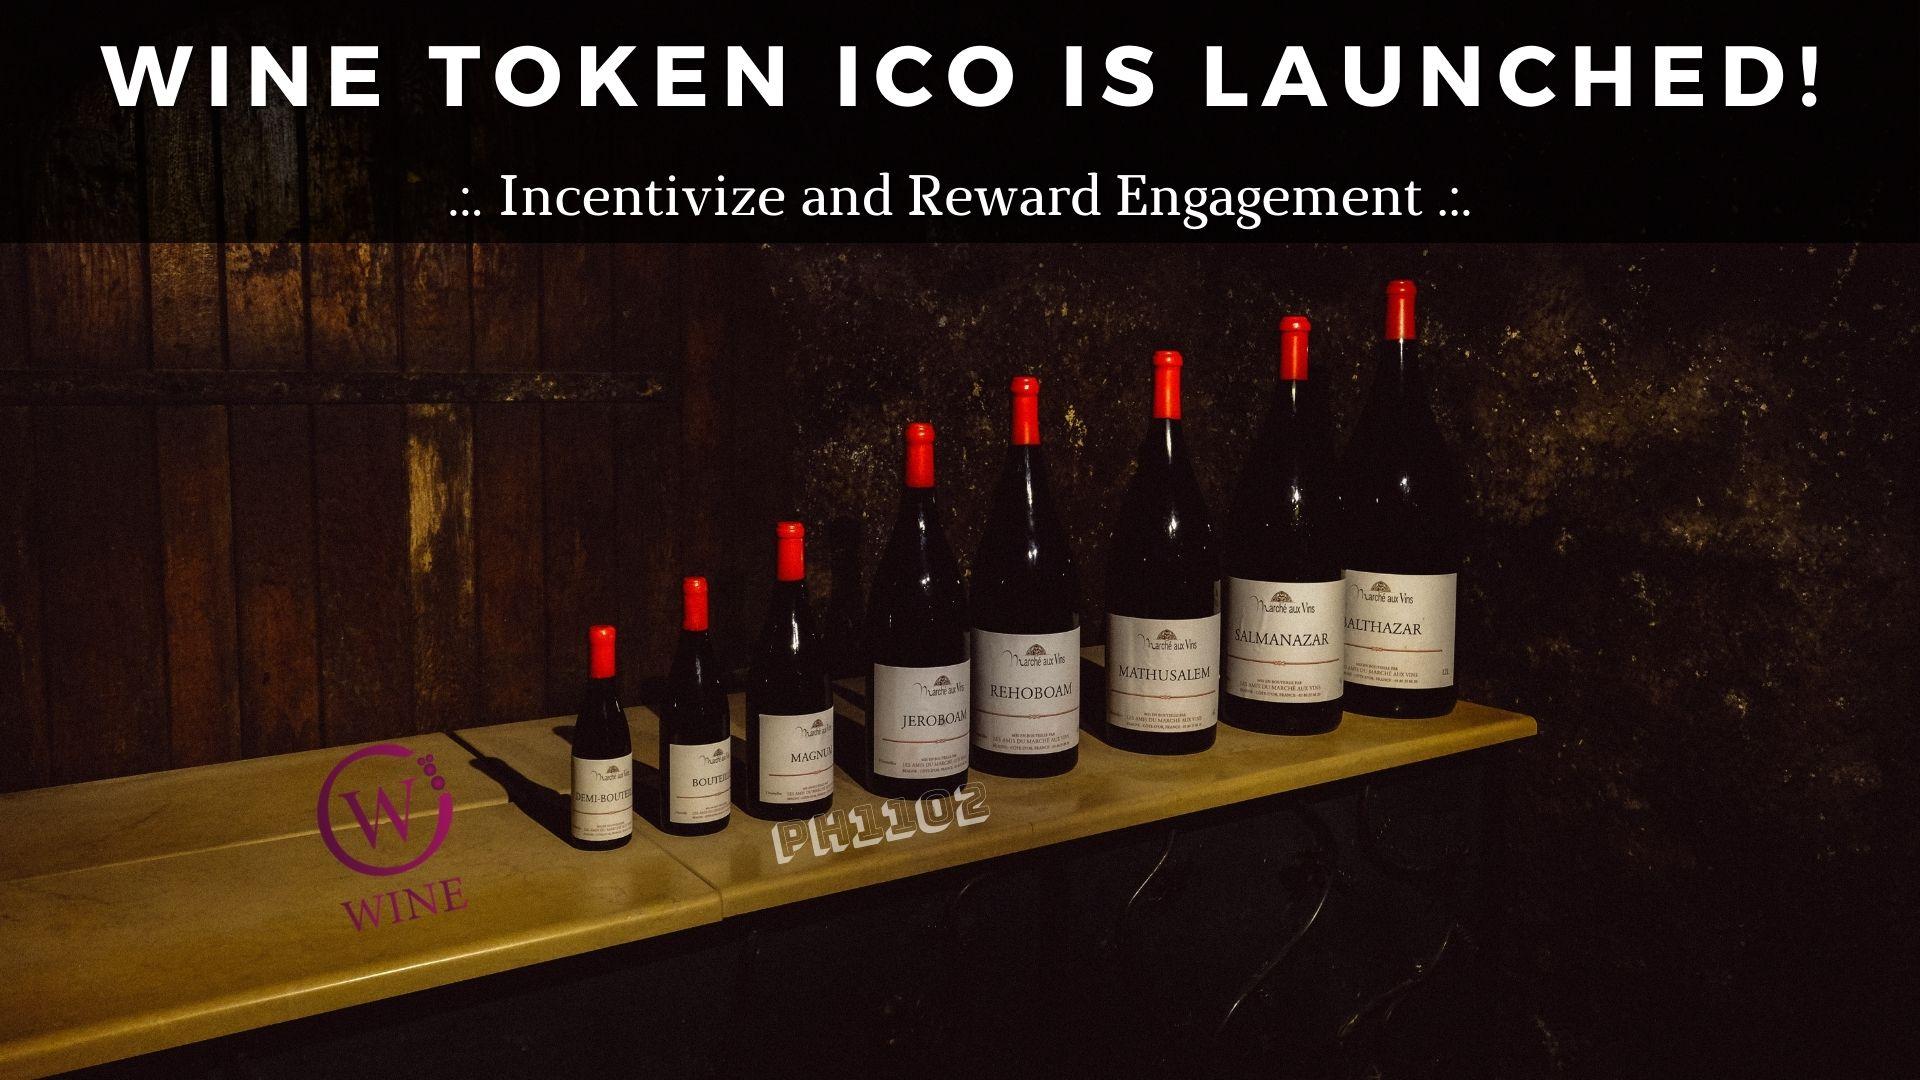 WINE token ICO is launched.jpg